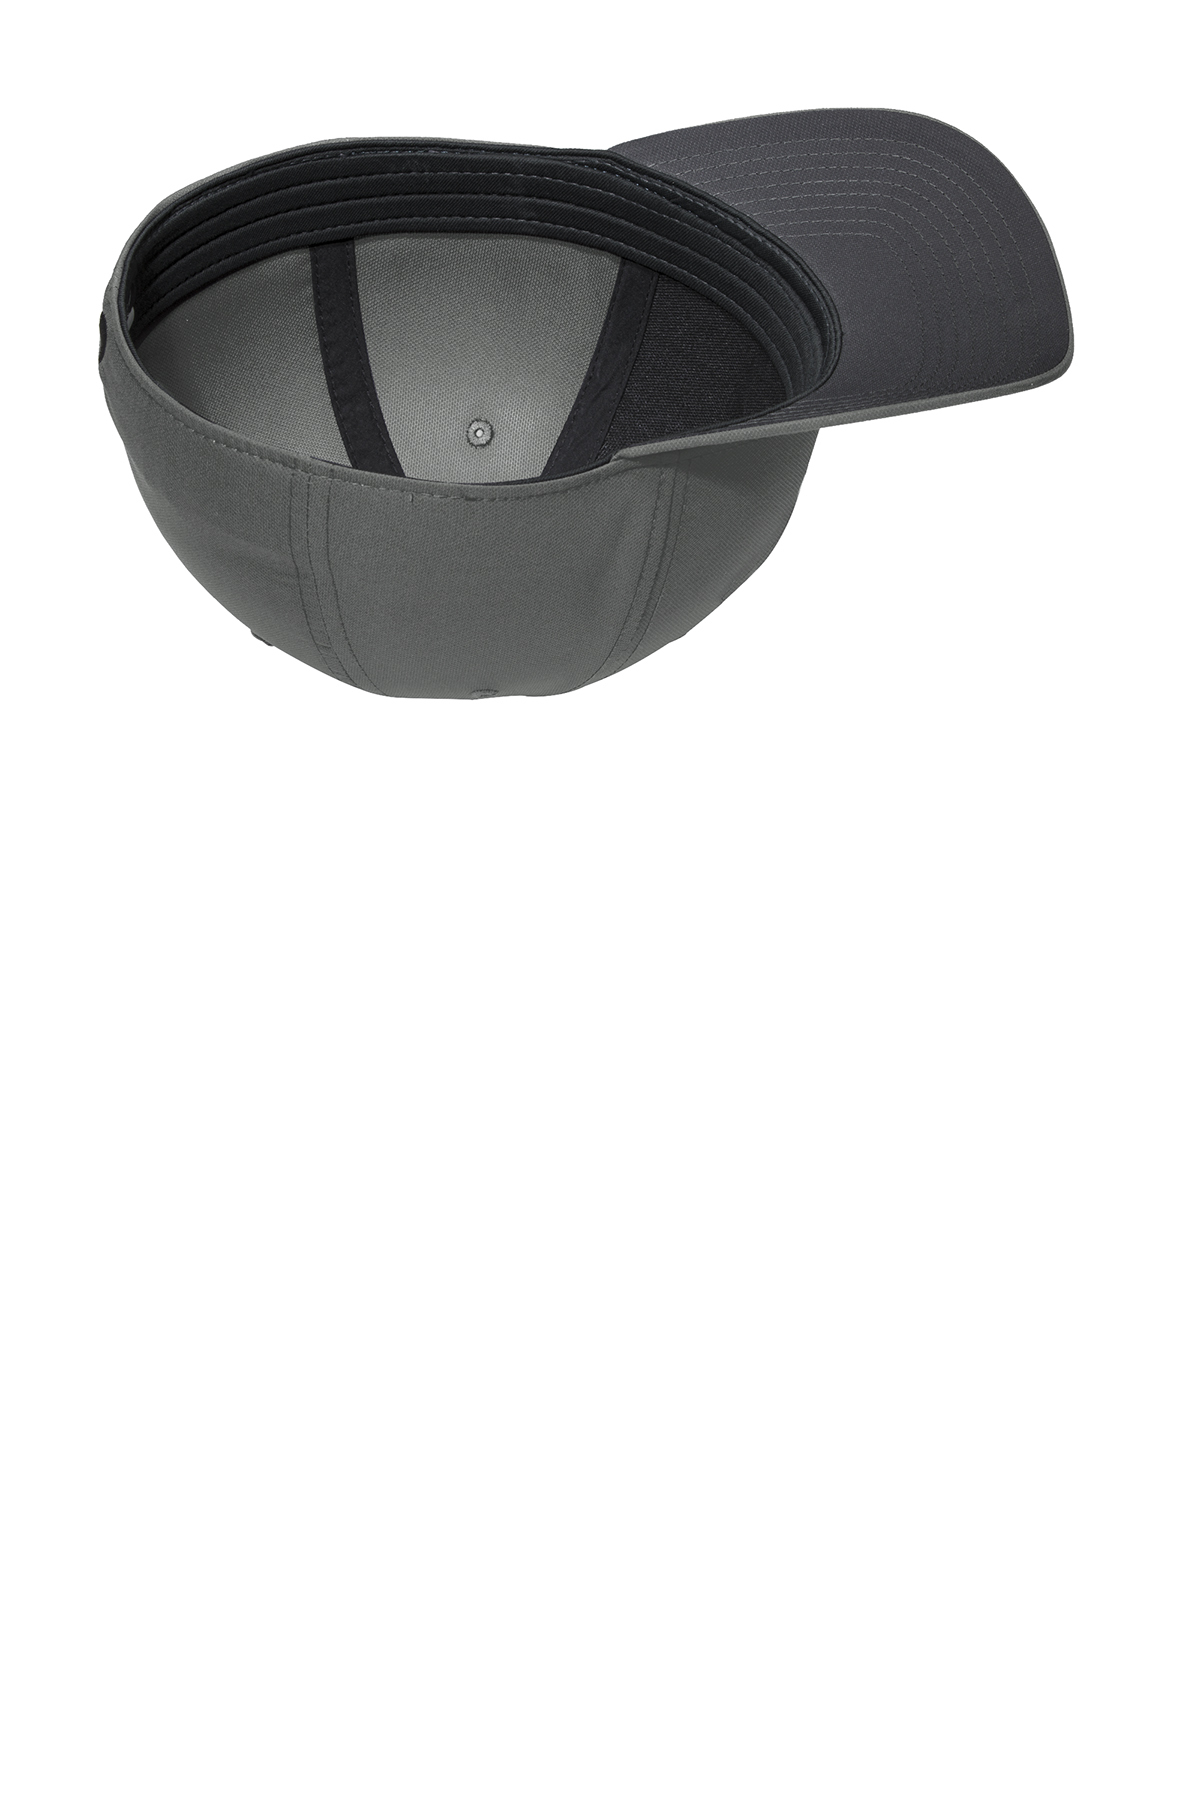 1580b912 Nike Dri-FIT Classic 99 Cap   Caps   SanMar